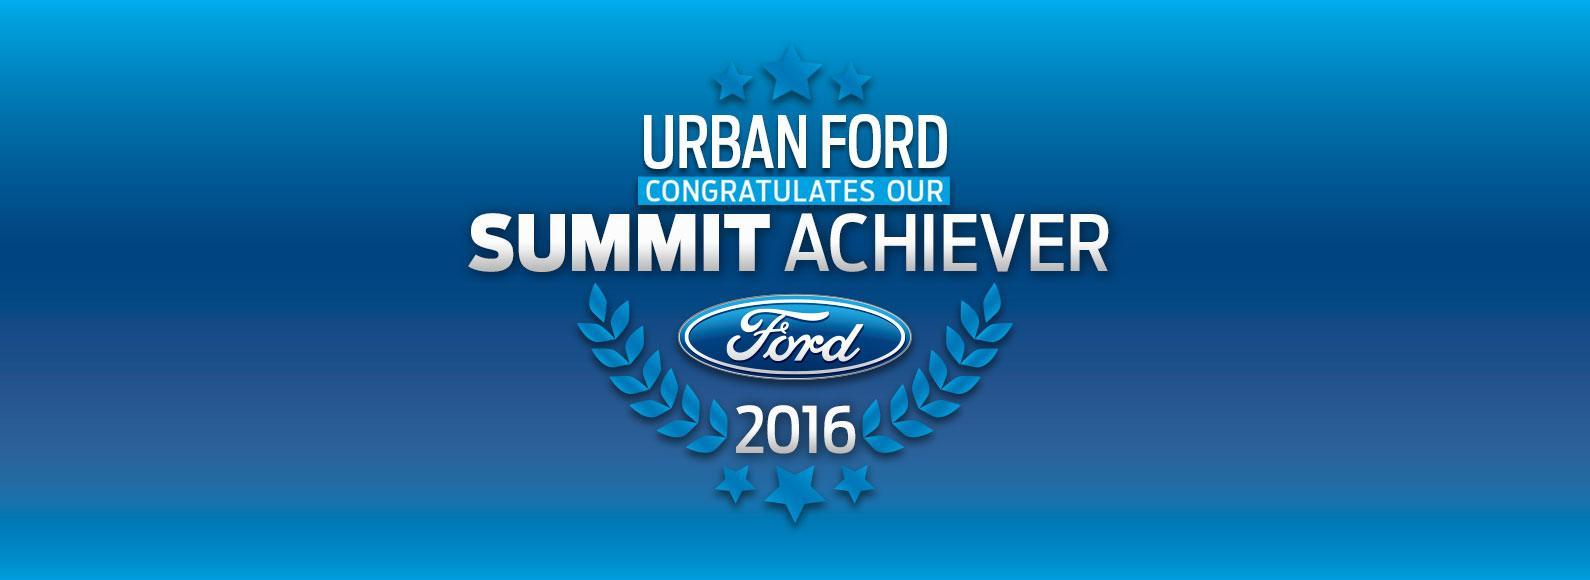 Urban Ford - Summit Achiever